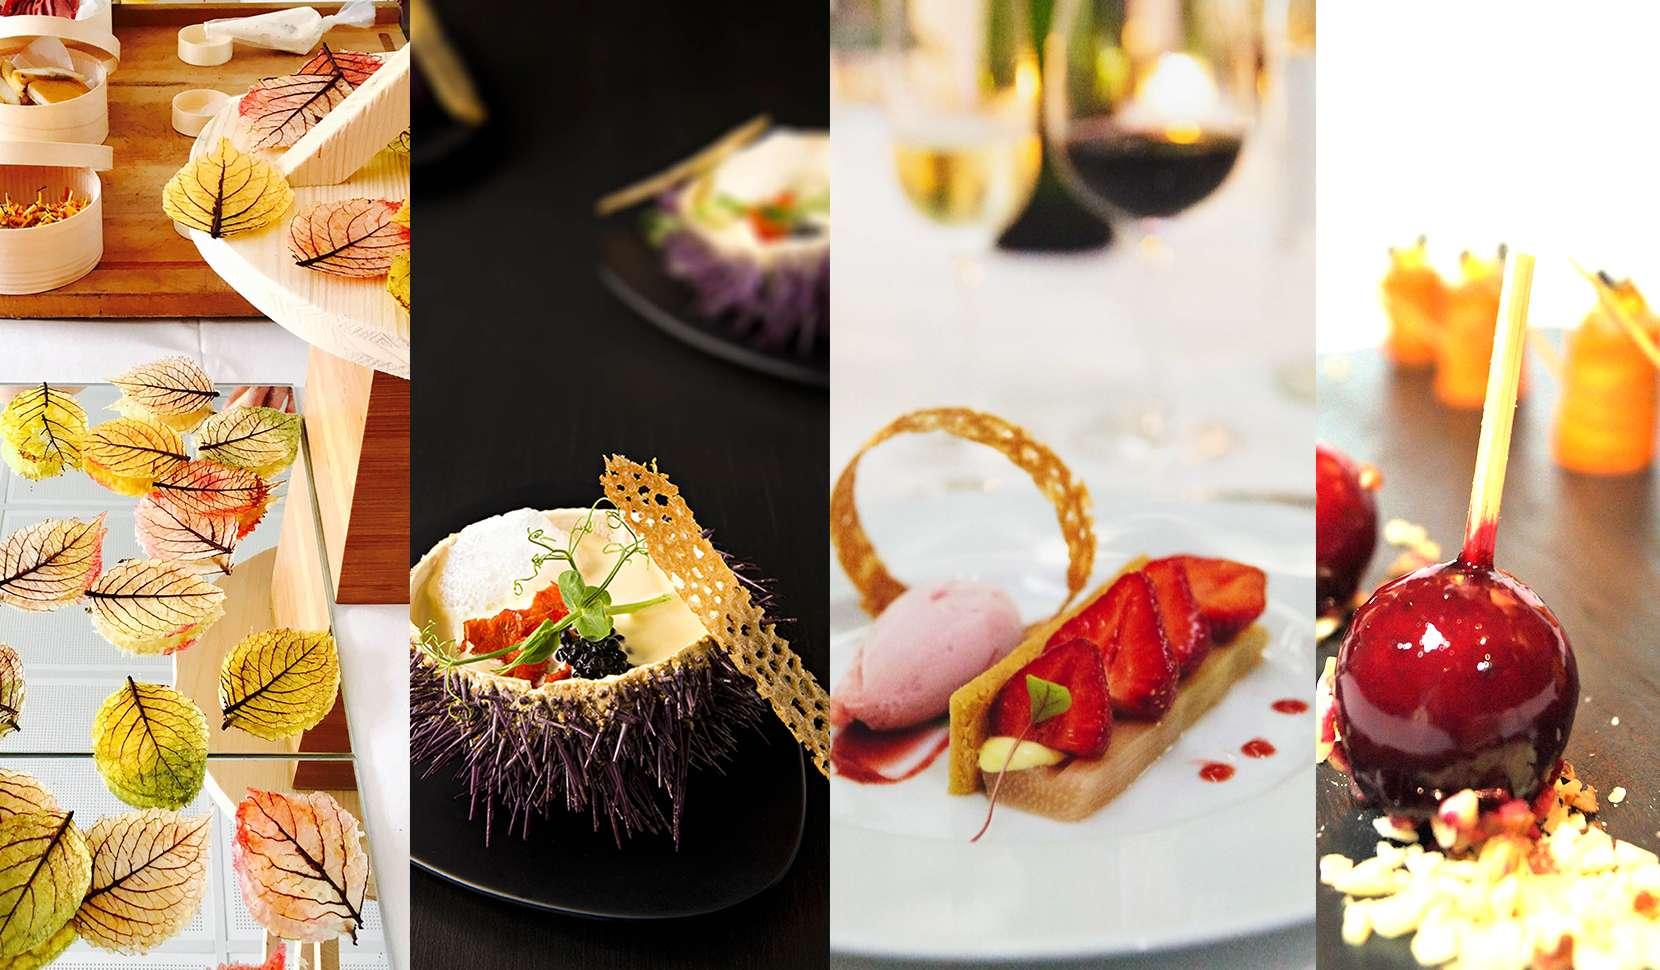 cuisine-mariage-lacoste-1660x970.jpg